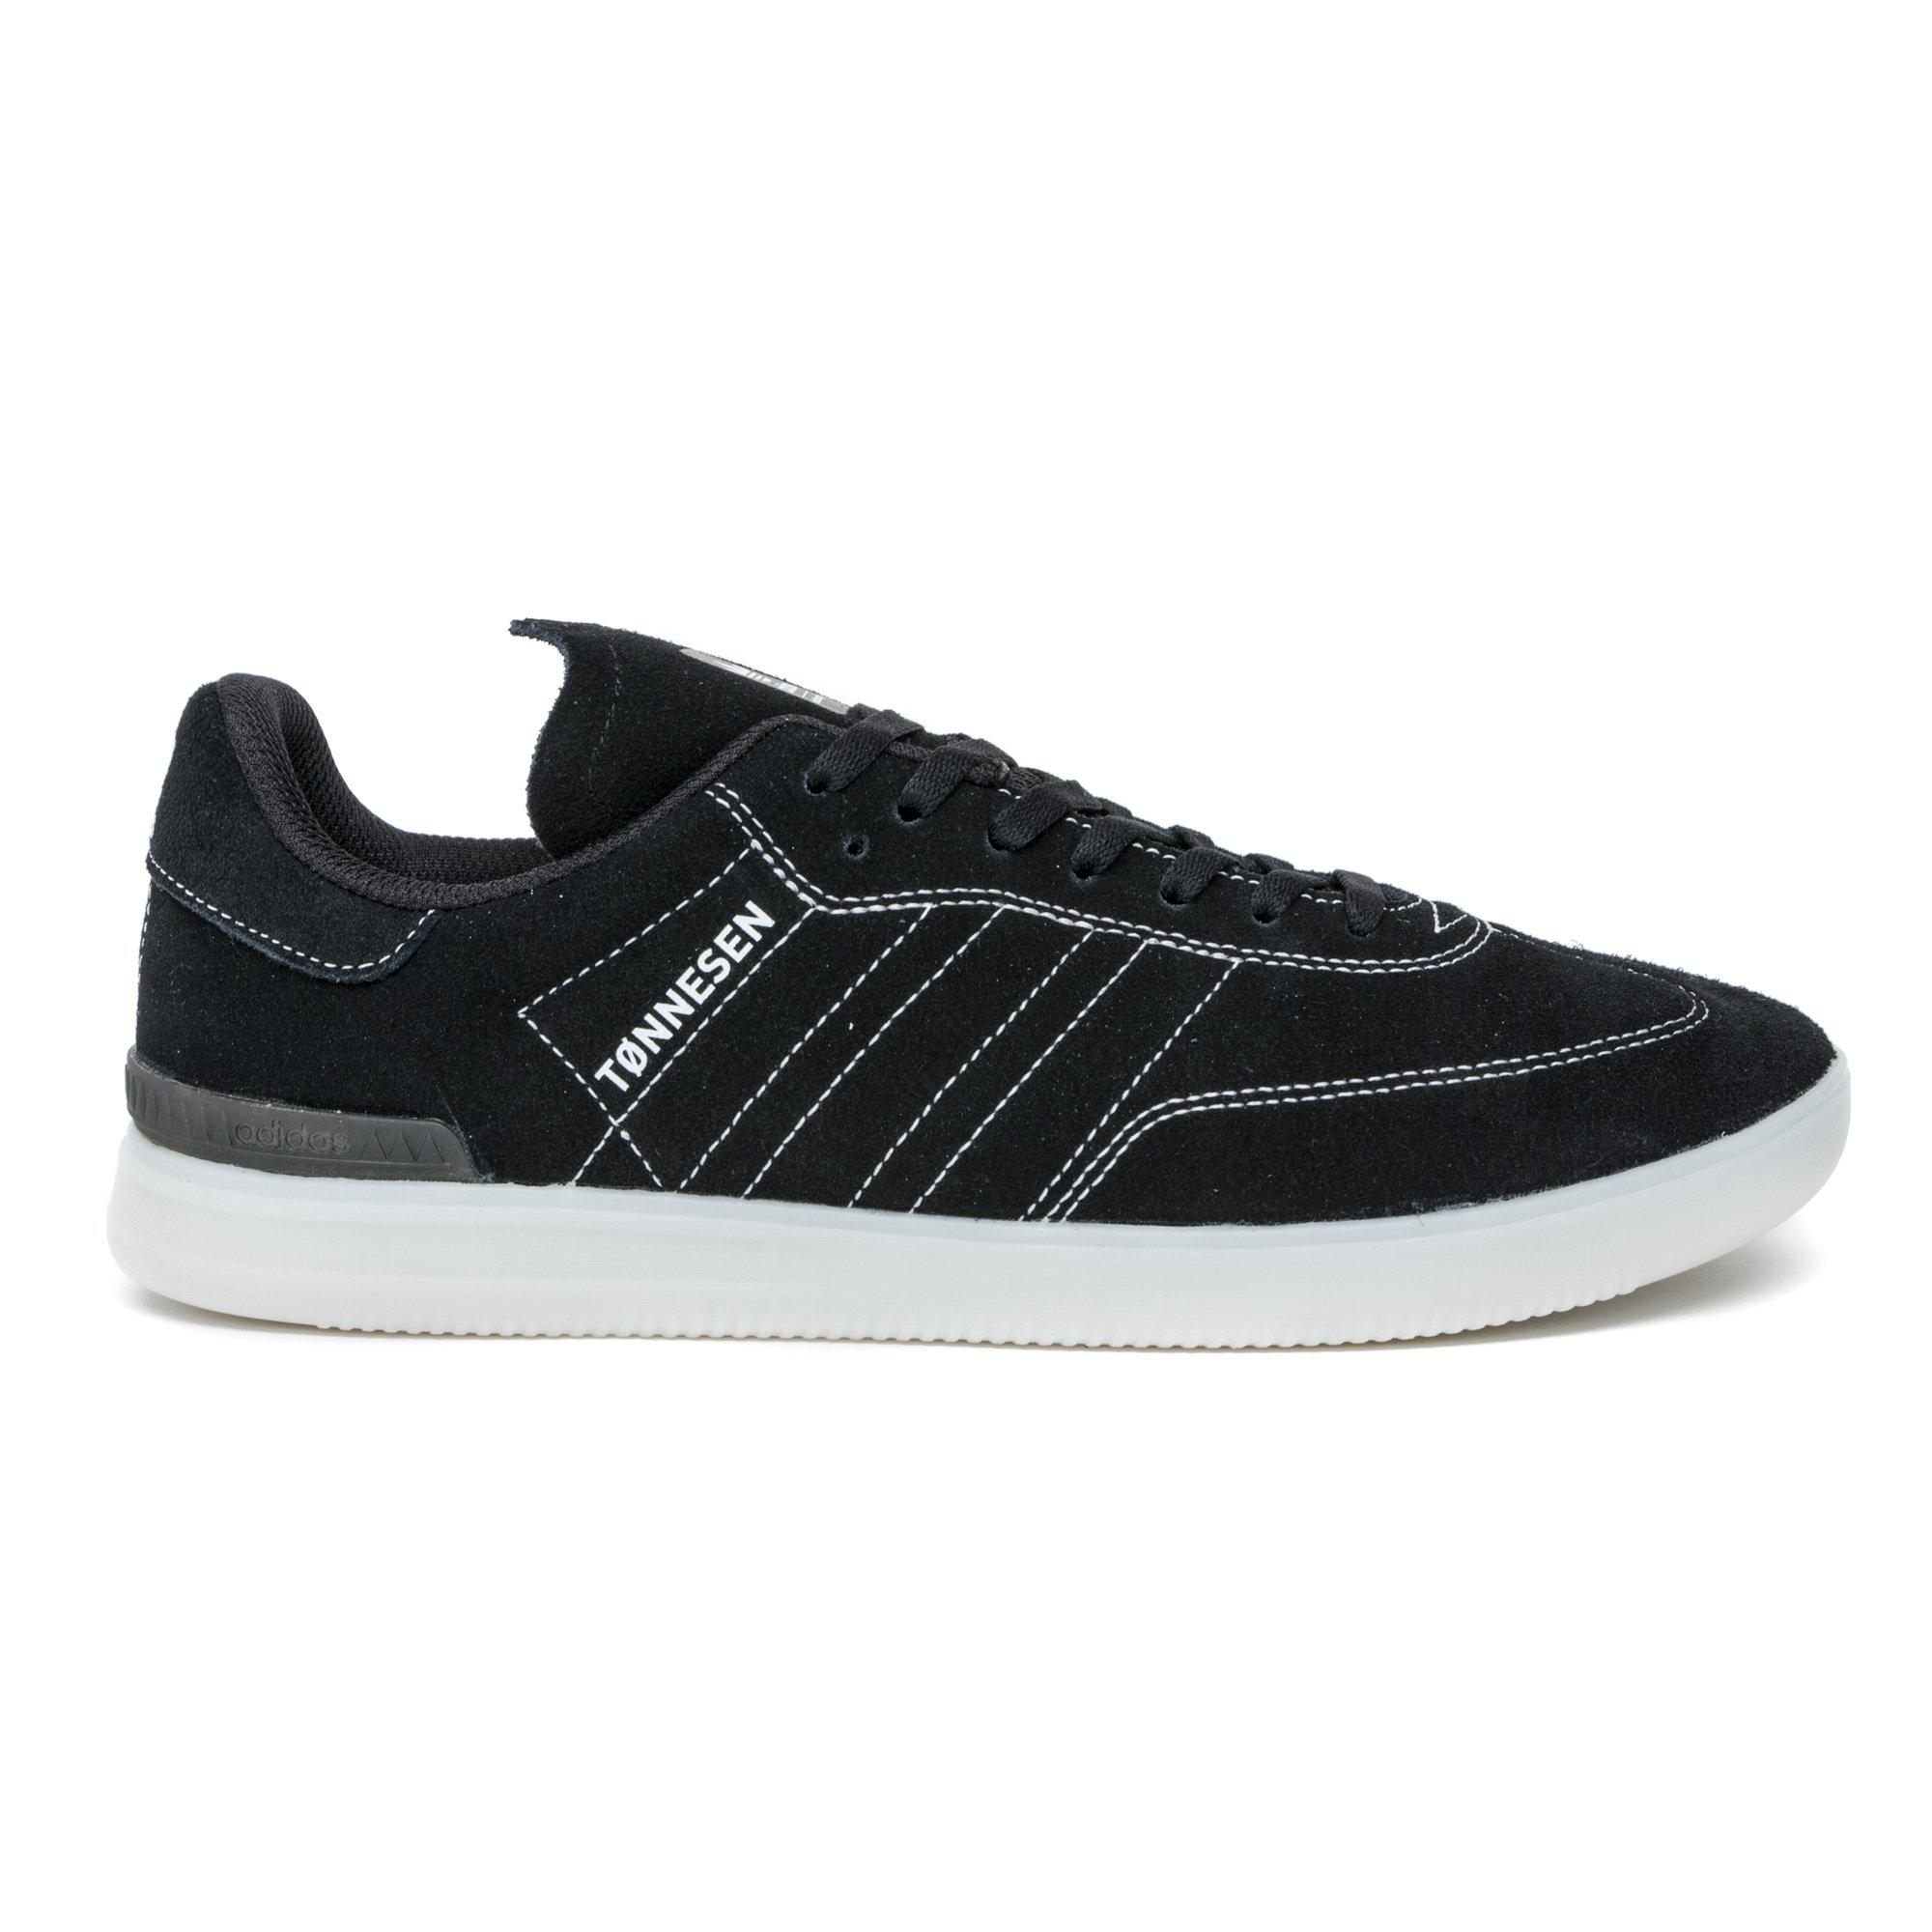 premium selection 8507f 8a8fd Adidas - Black Samba Adv Shoes for Men - Lyst. View fullscreen